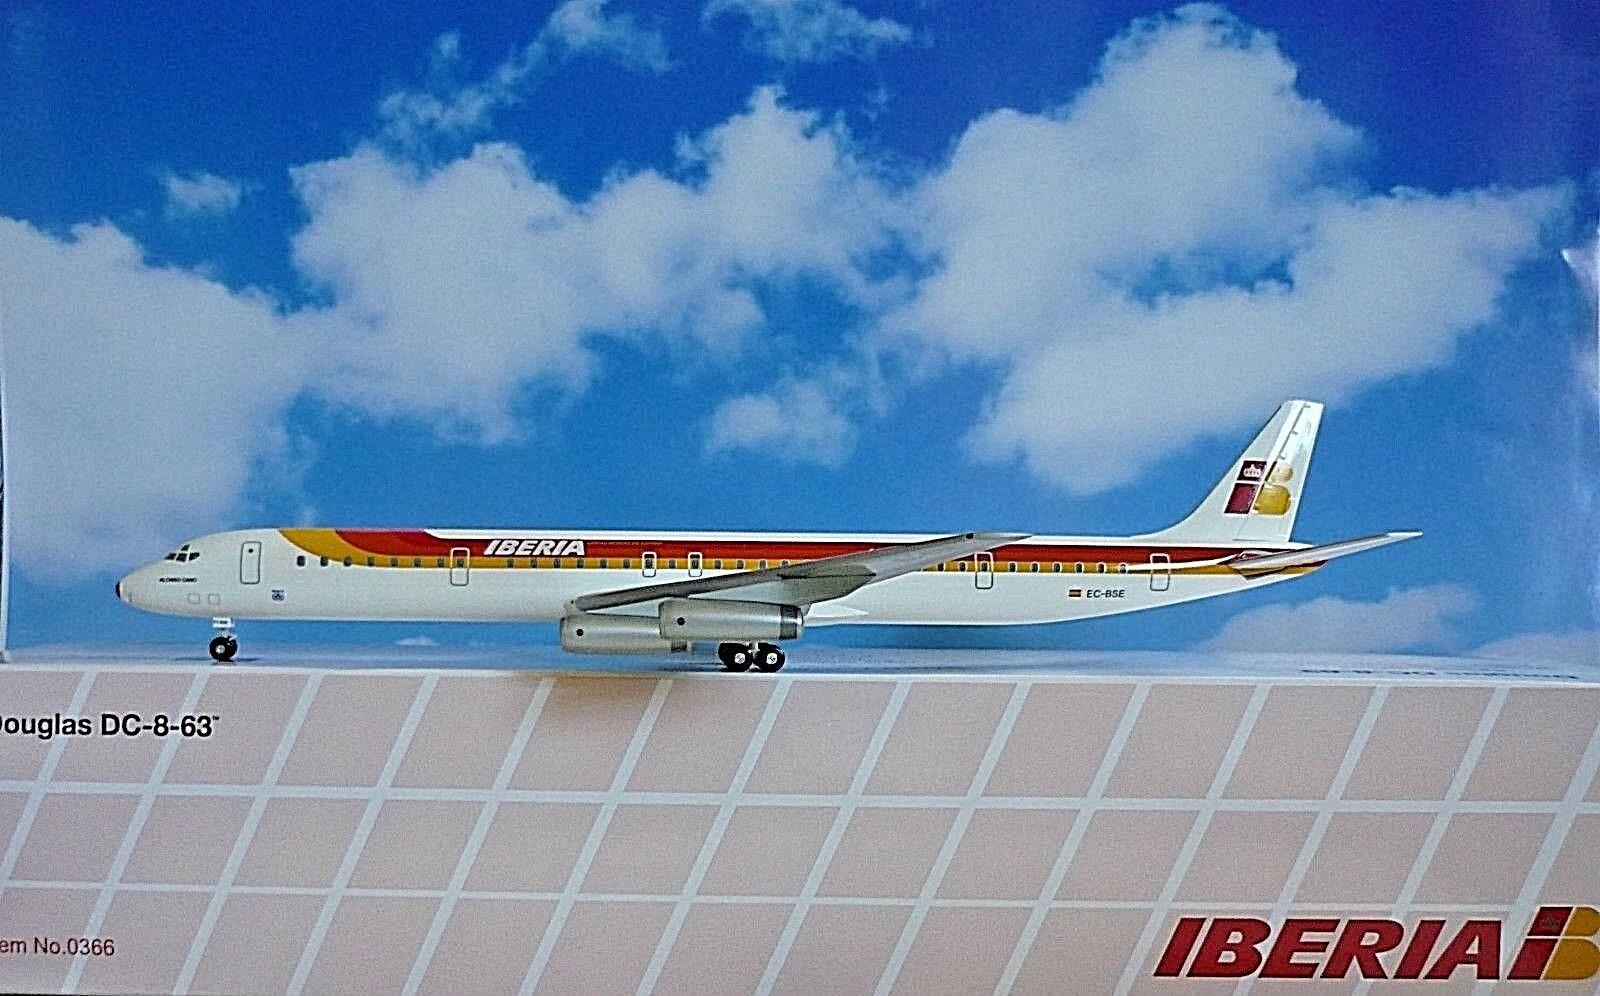 Hogan Wings 1 200 Douglas DC-8-63 Iberia Ec-Bse LI0366+ Herpa Wings Catalogue